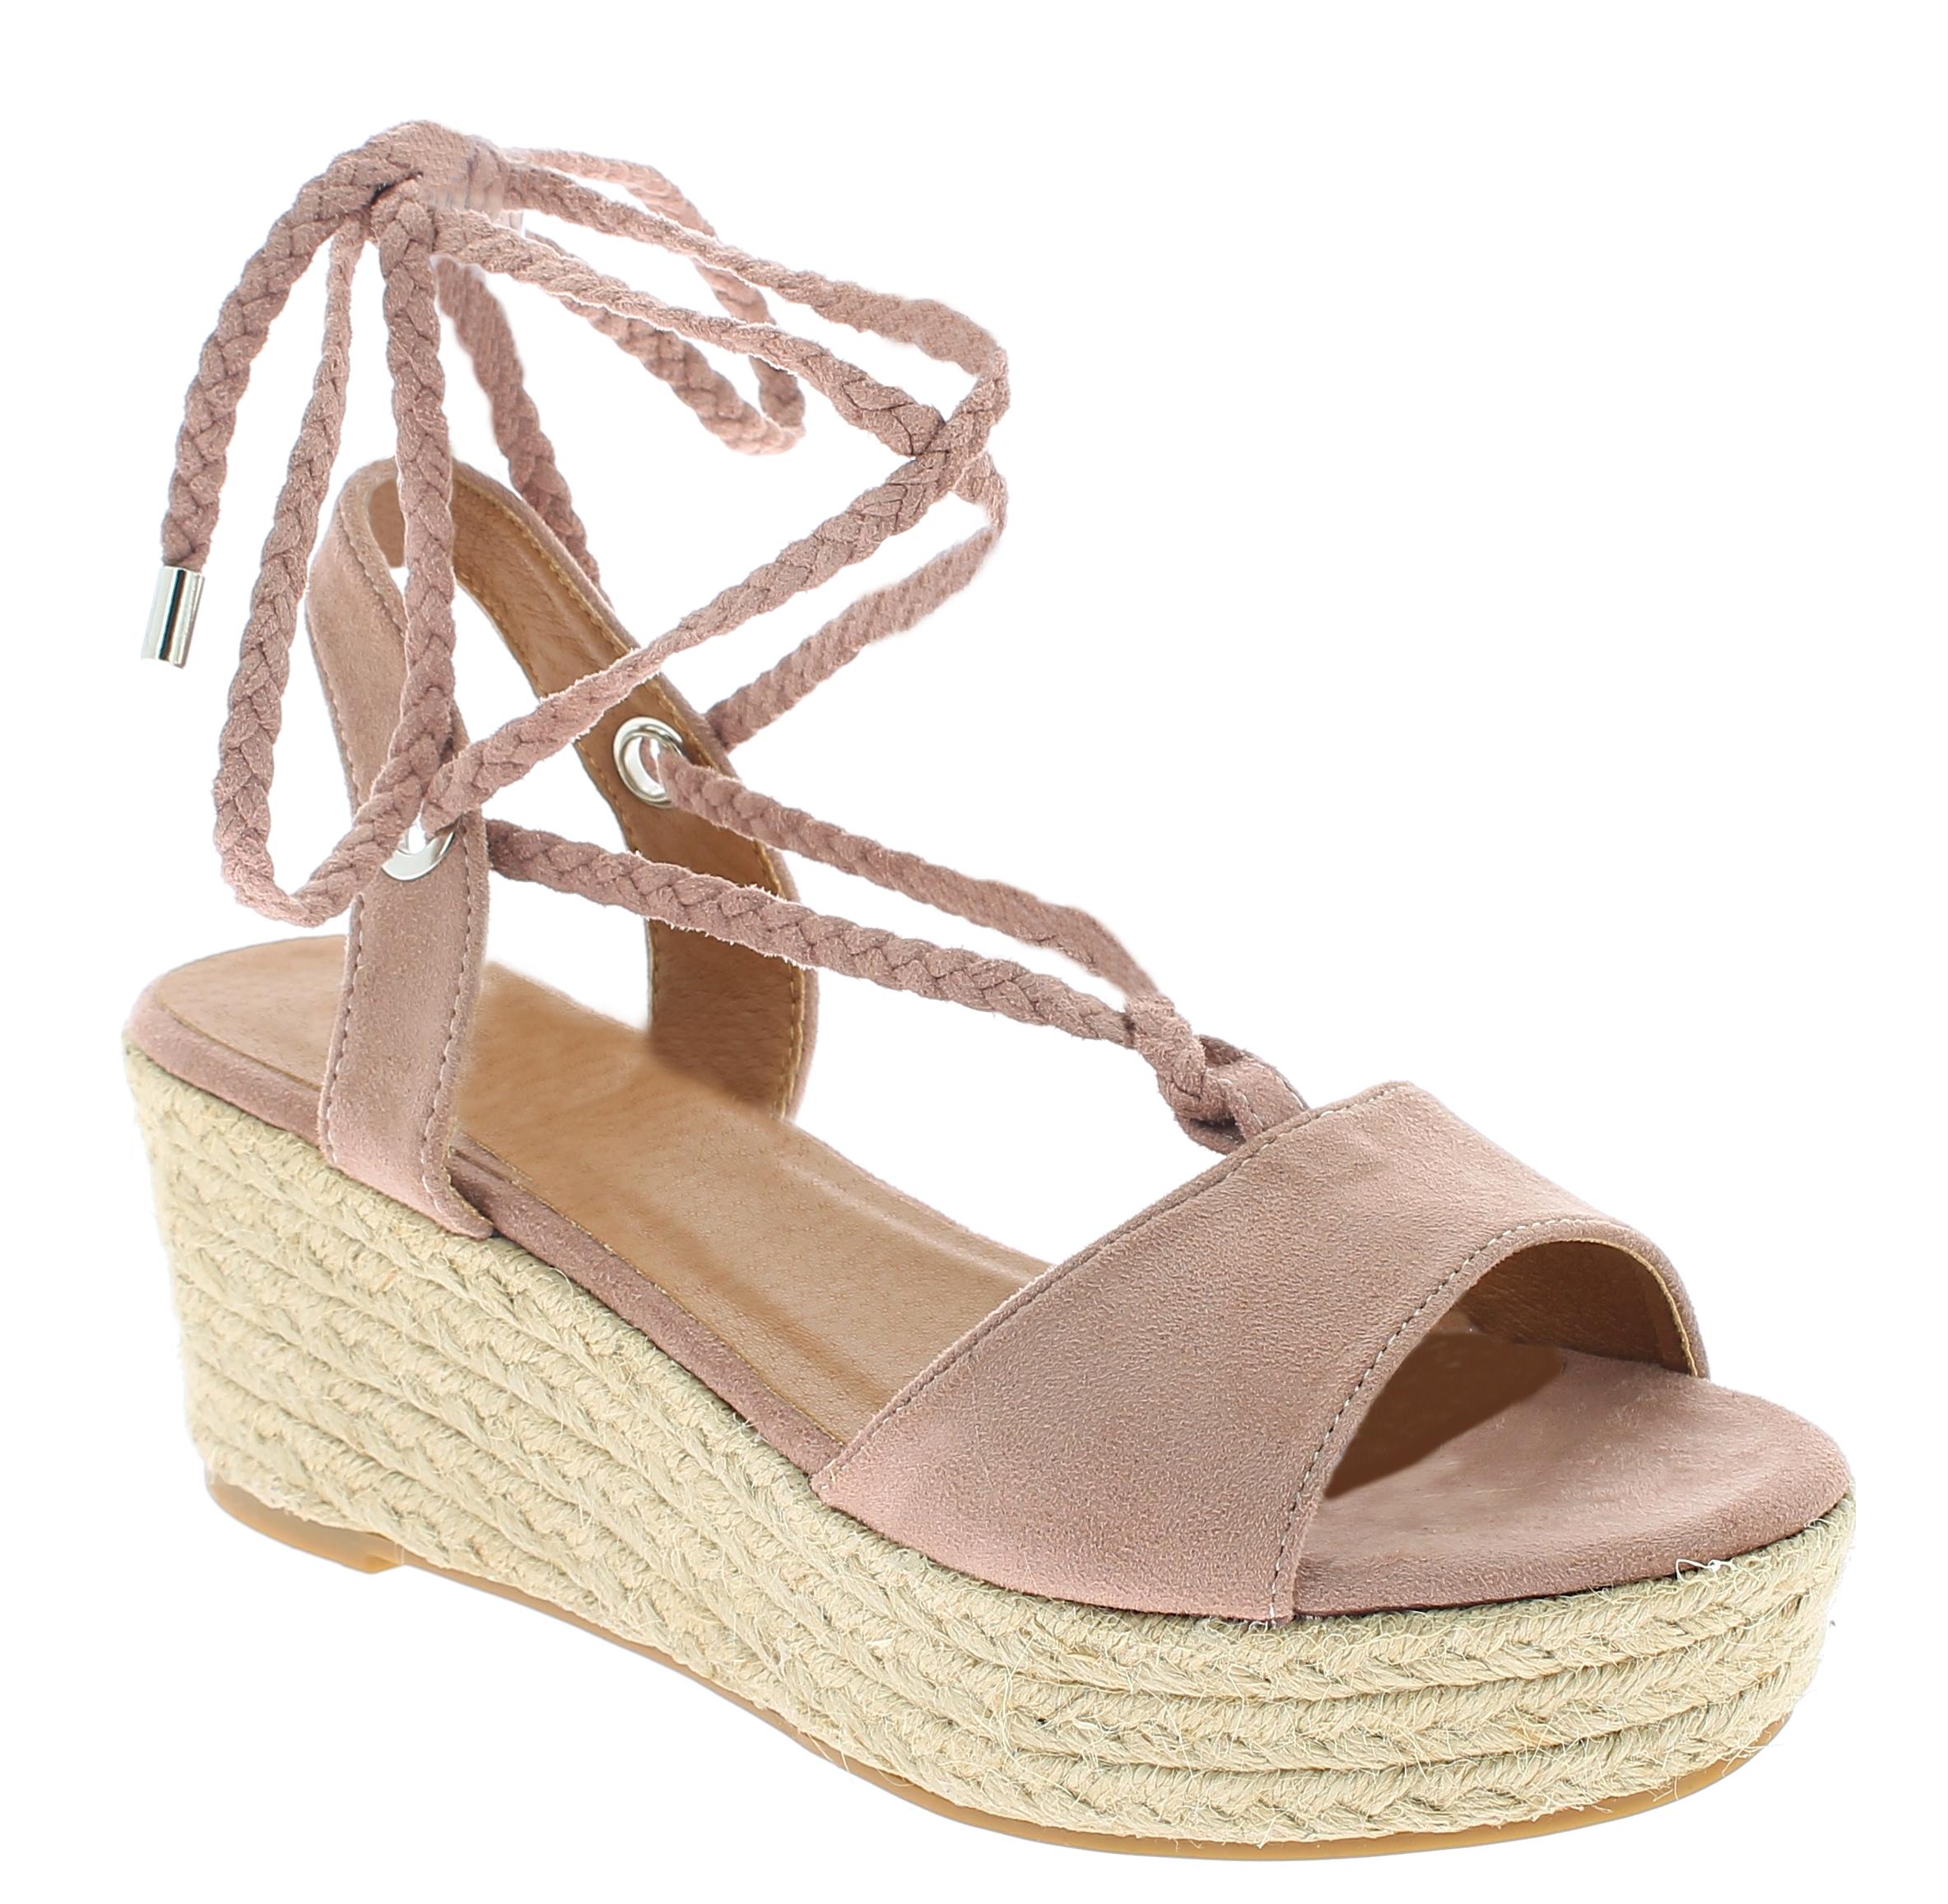 IQSHOES Γυναικεία Πλατφόρμα 3A363 Ρόζ - IqShoes - 3A363 PINK-pink-37/1/11/27 παπούτσια  πέδιλα